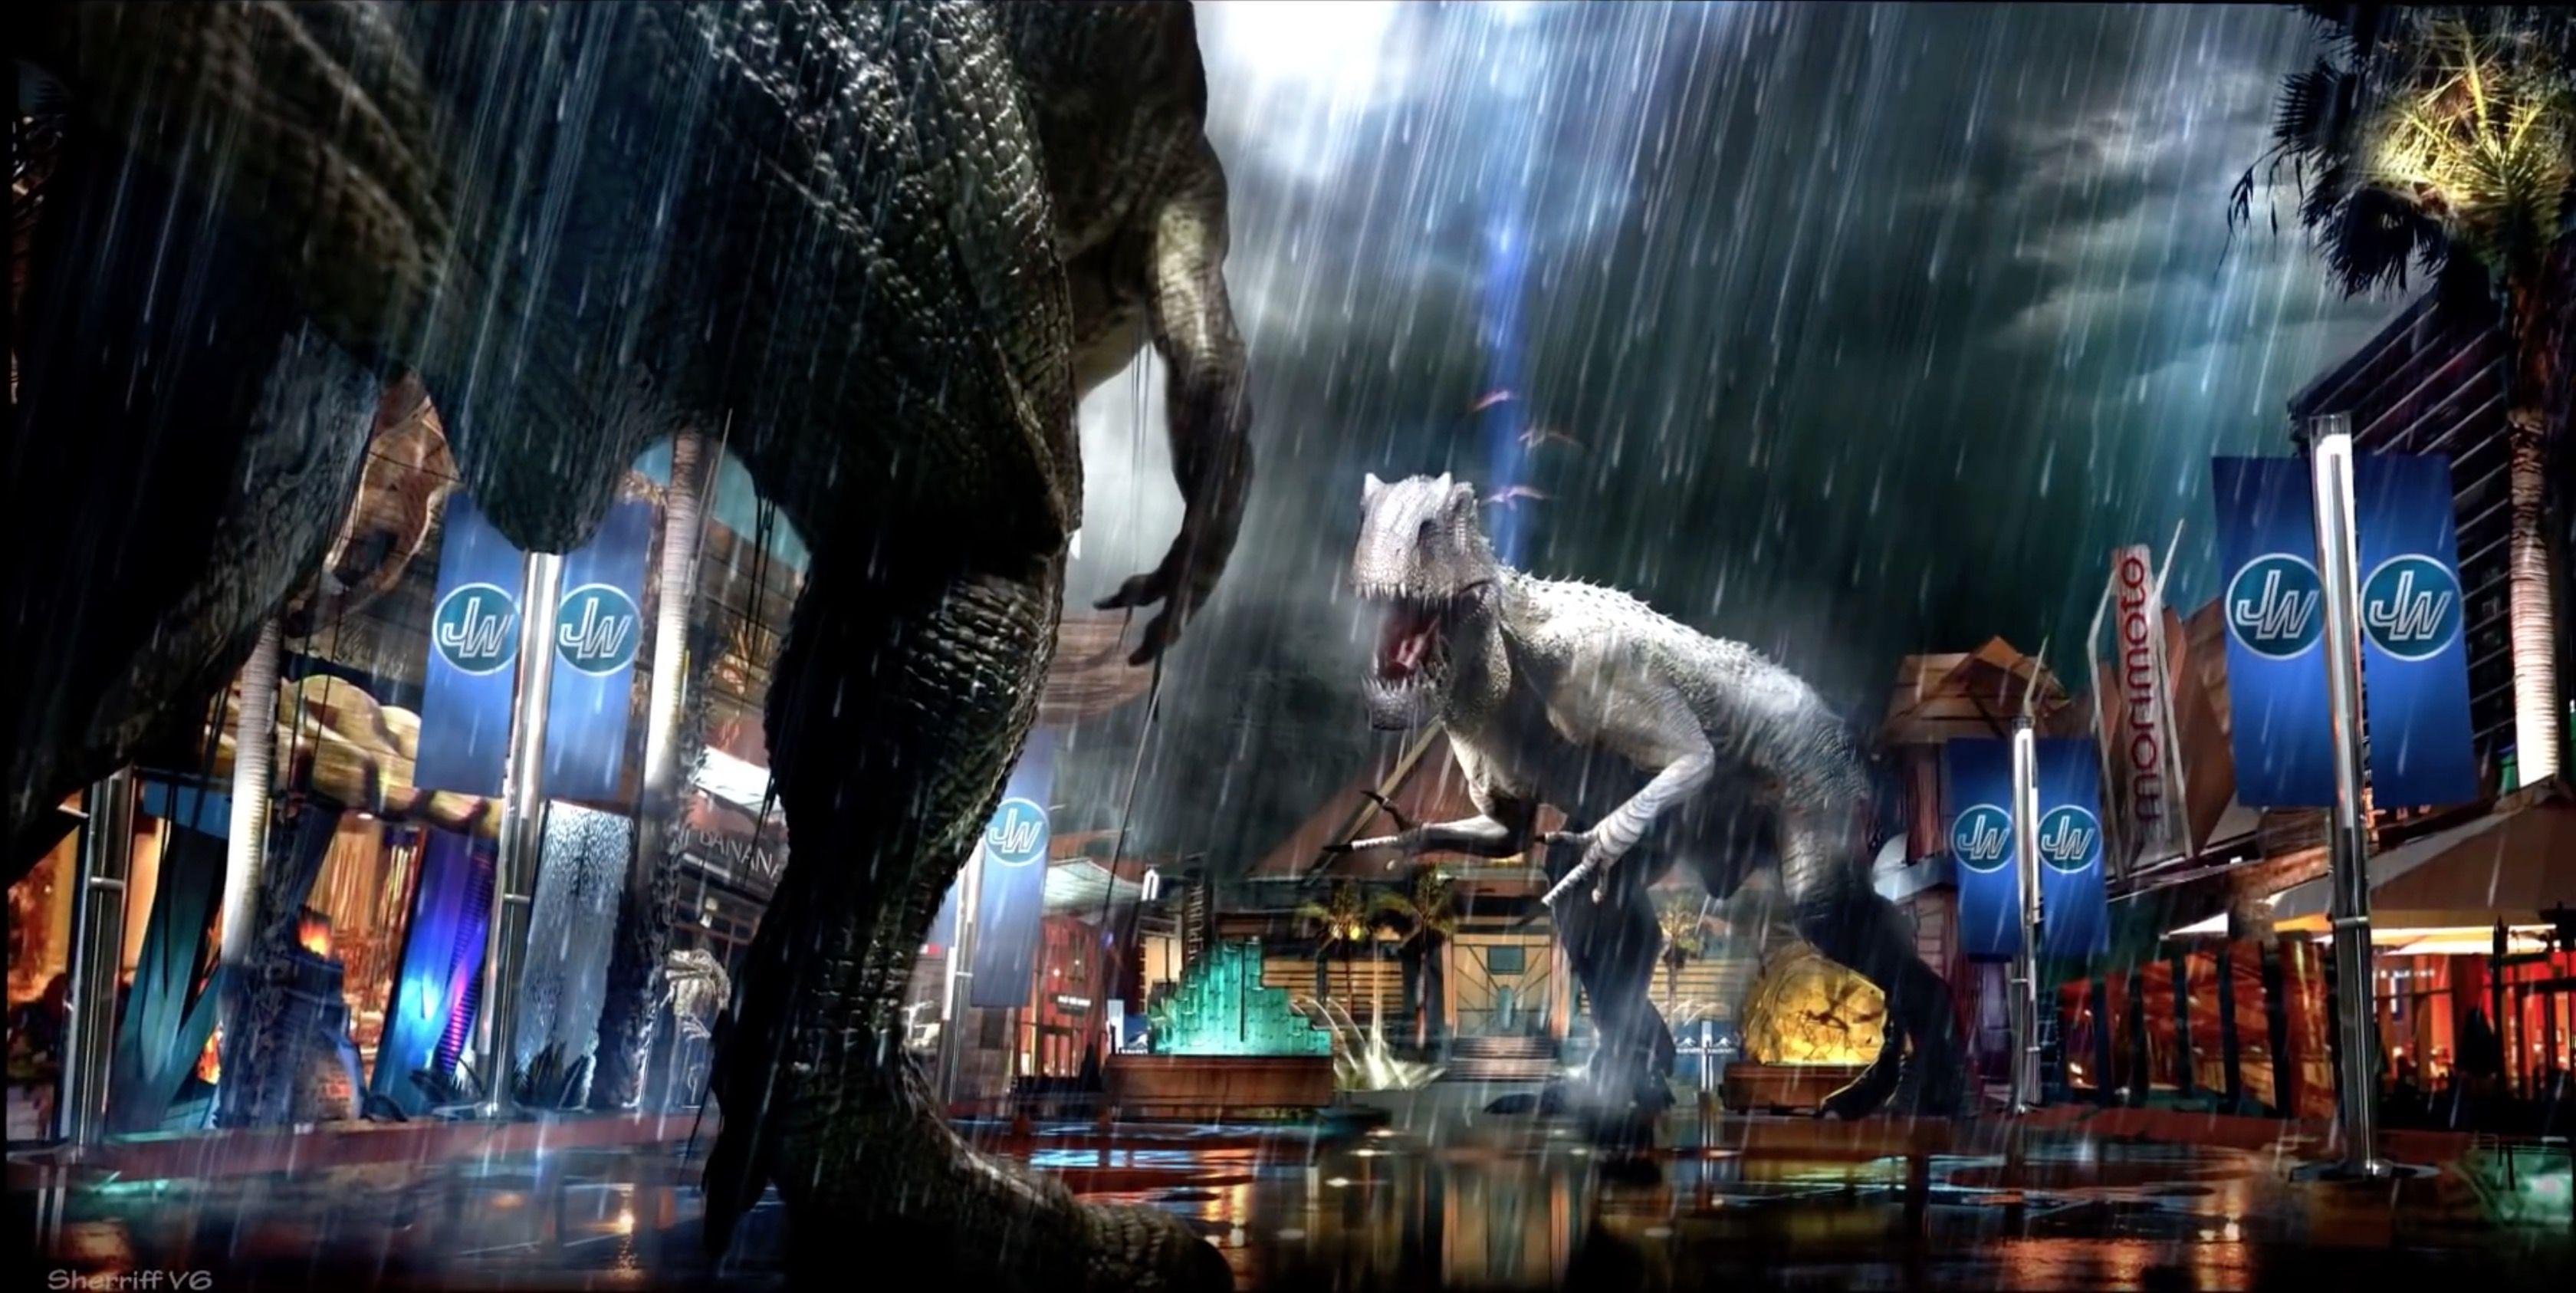 Jurassic Park 3 Concept Art Jurassic World From Concept Art To